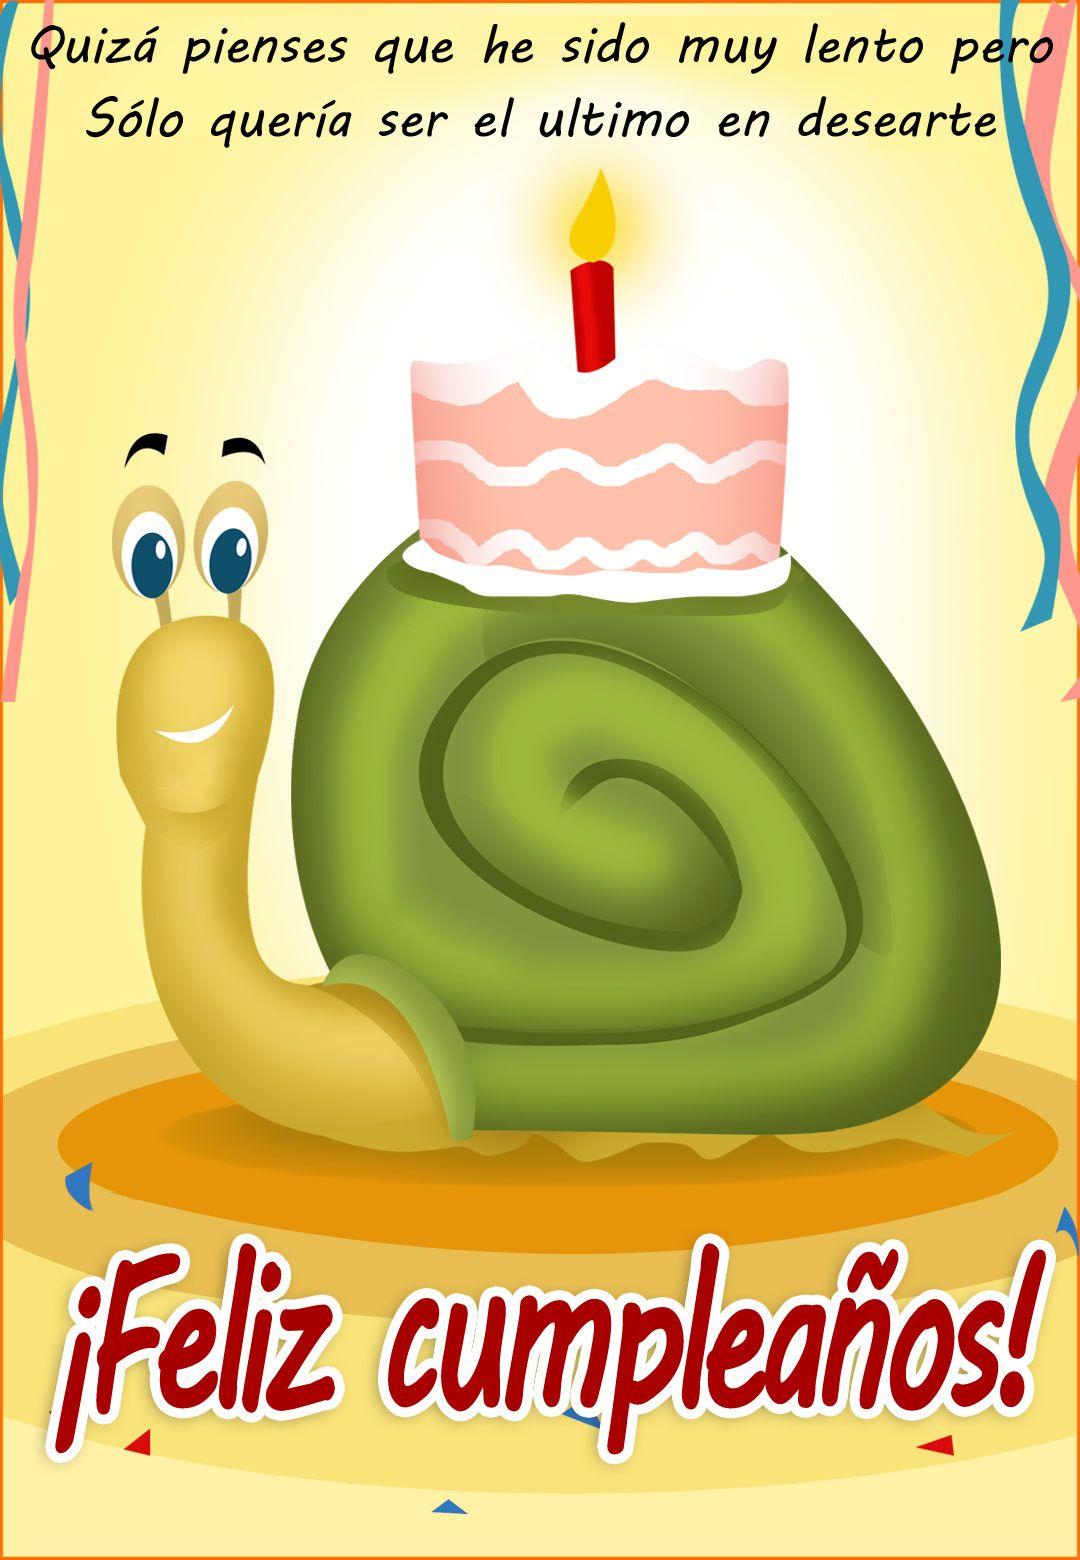 Pin By Angie Guzman On Feliz Cumpleanos Pinterest Happy Birthday